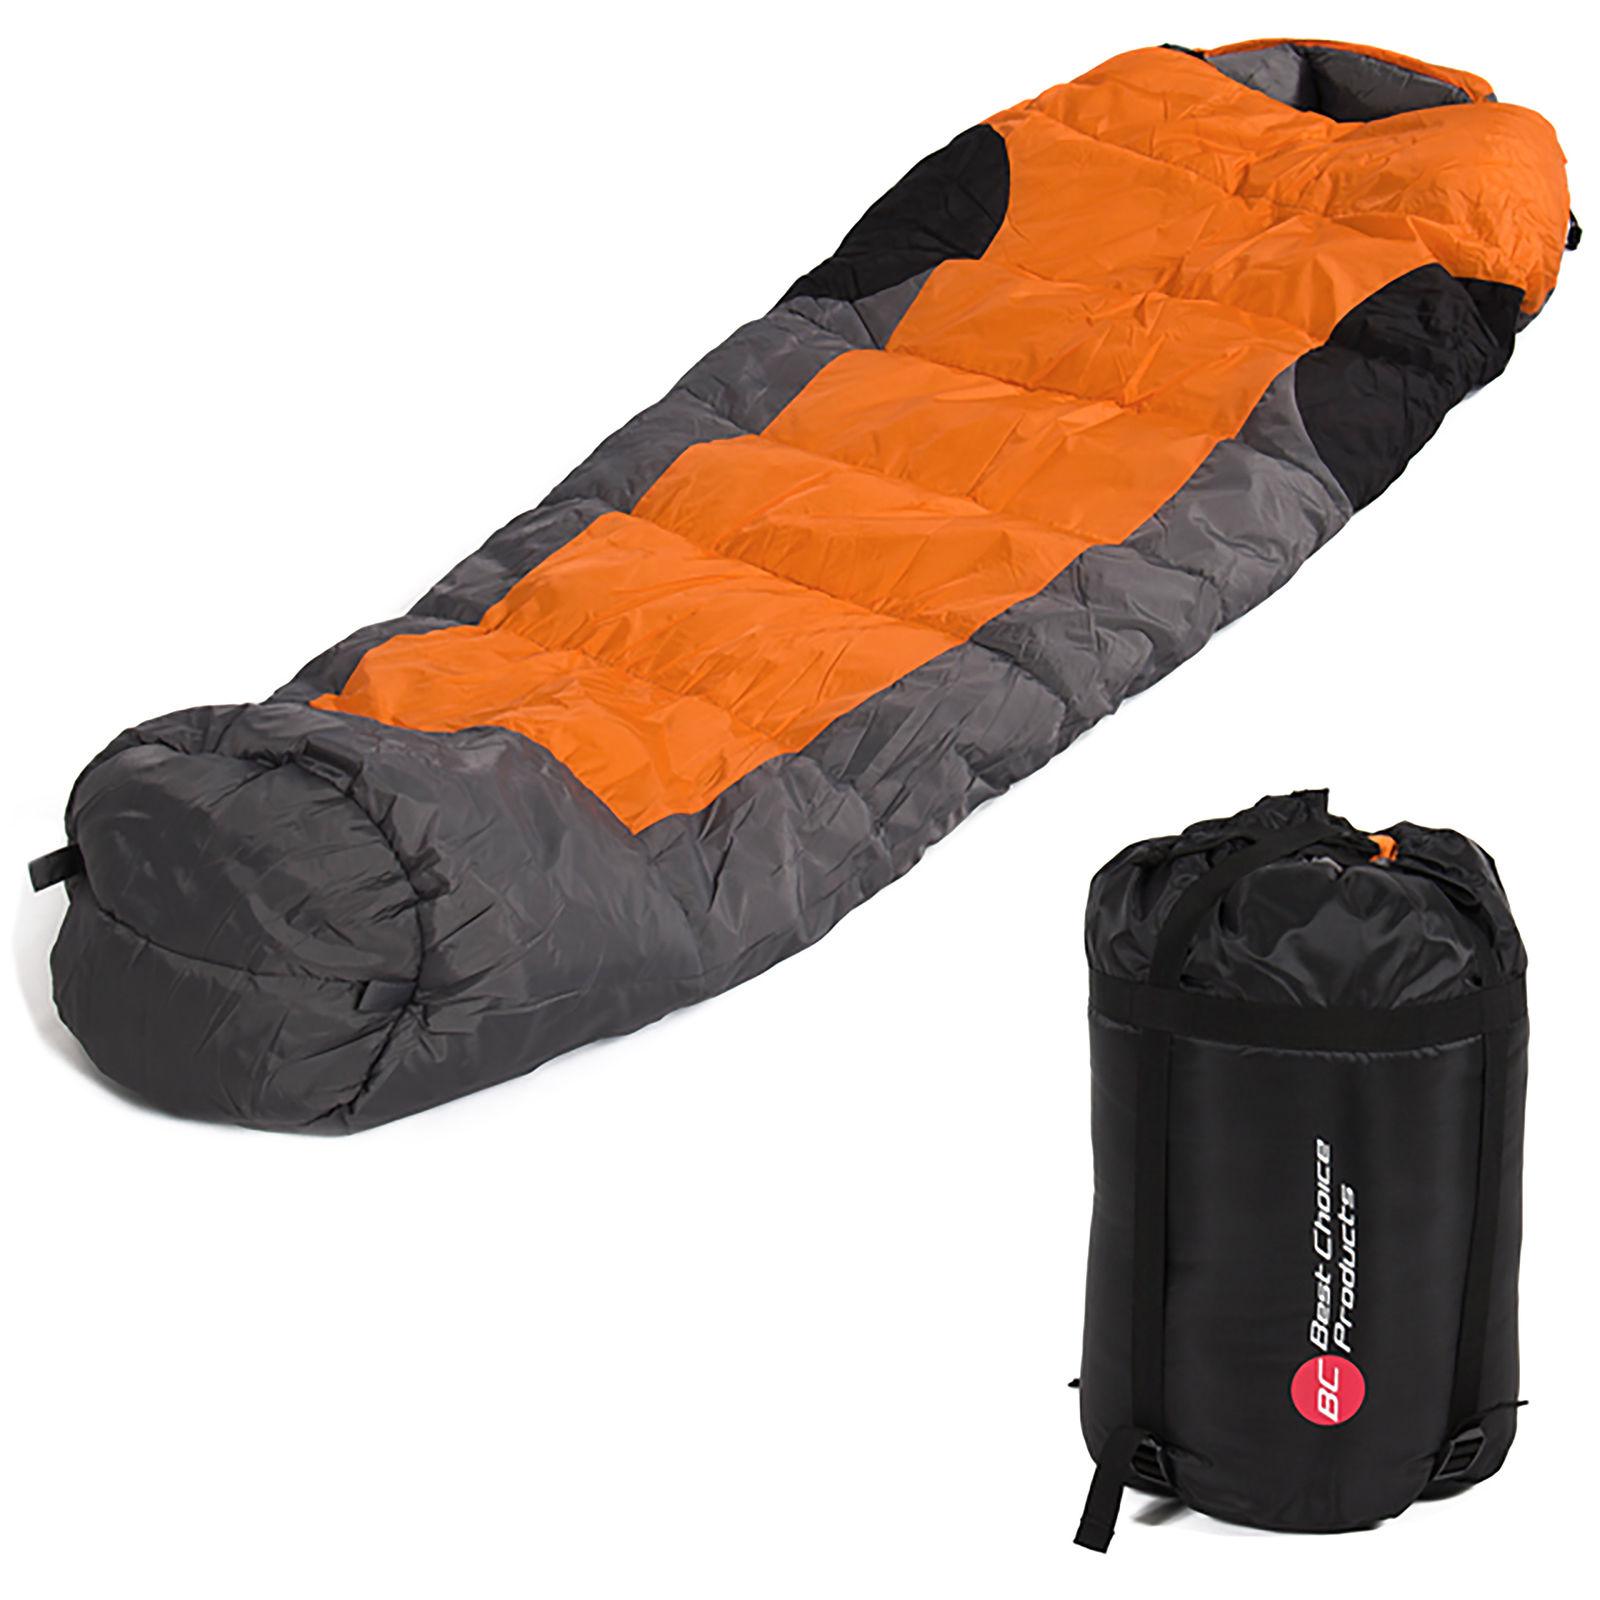 New Mummy Sleeping Bag 15c Camping